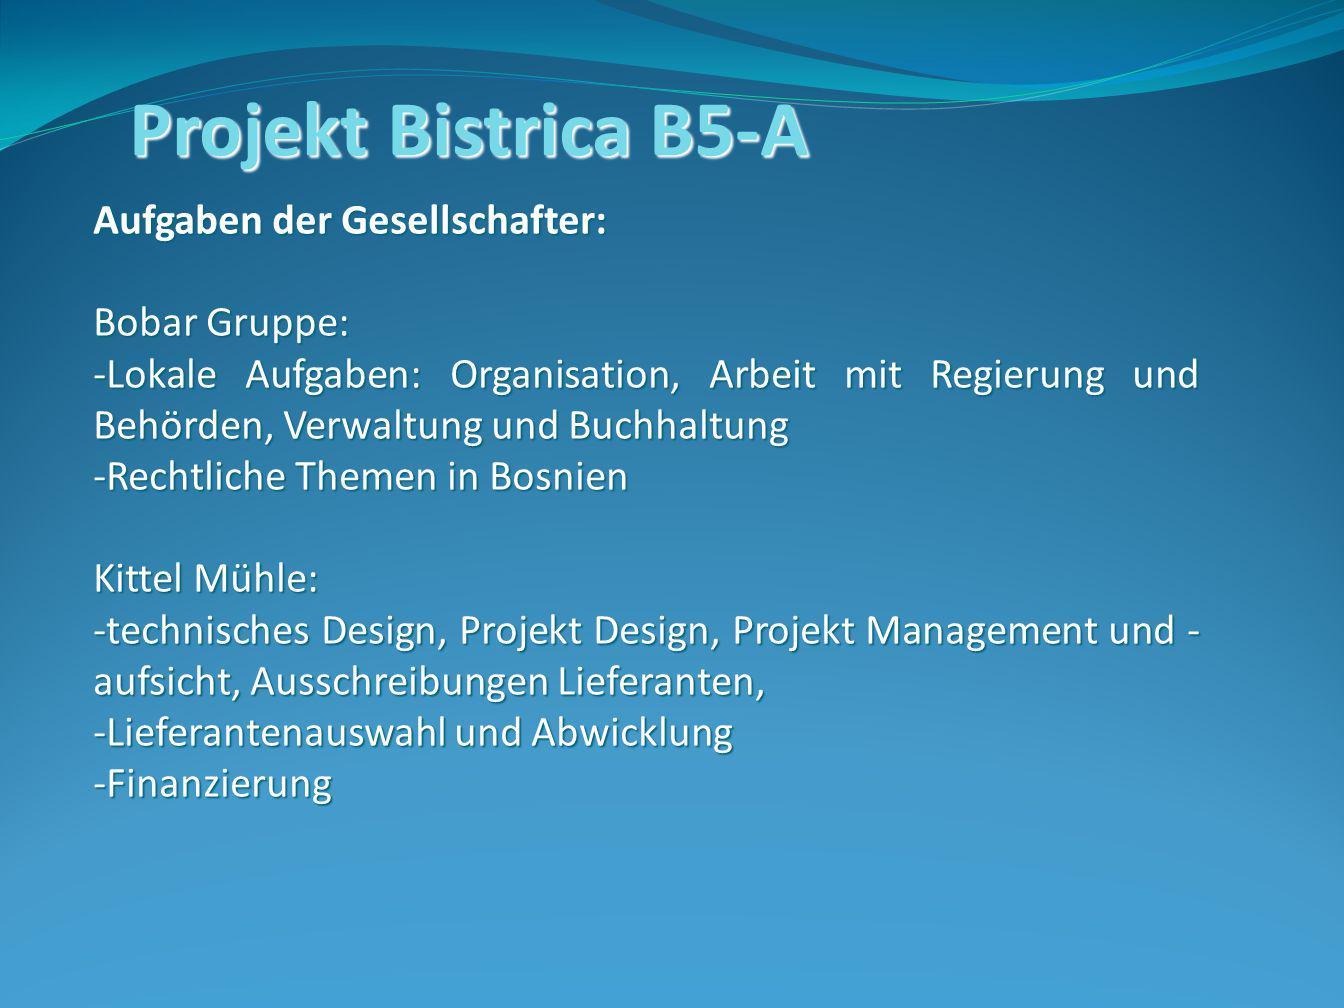 Projekt Bistrica B5-A Aufgaben der Gesellschafter: Bobar Gruppe: